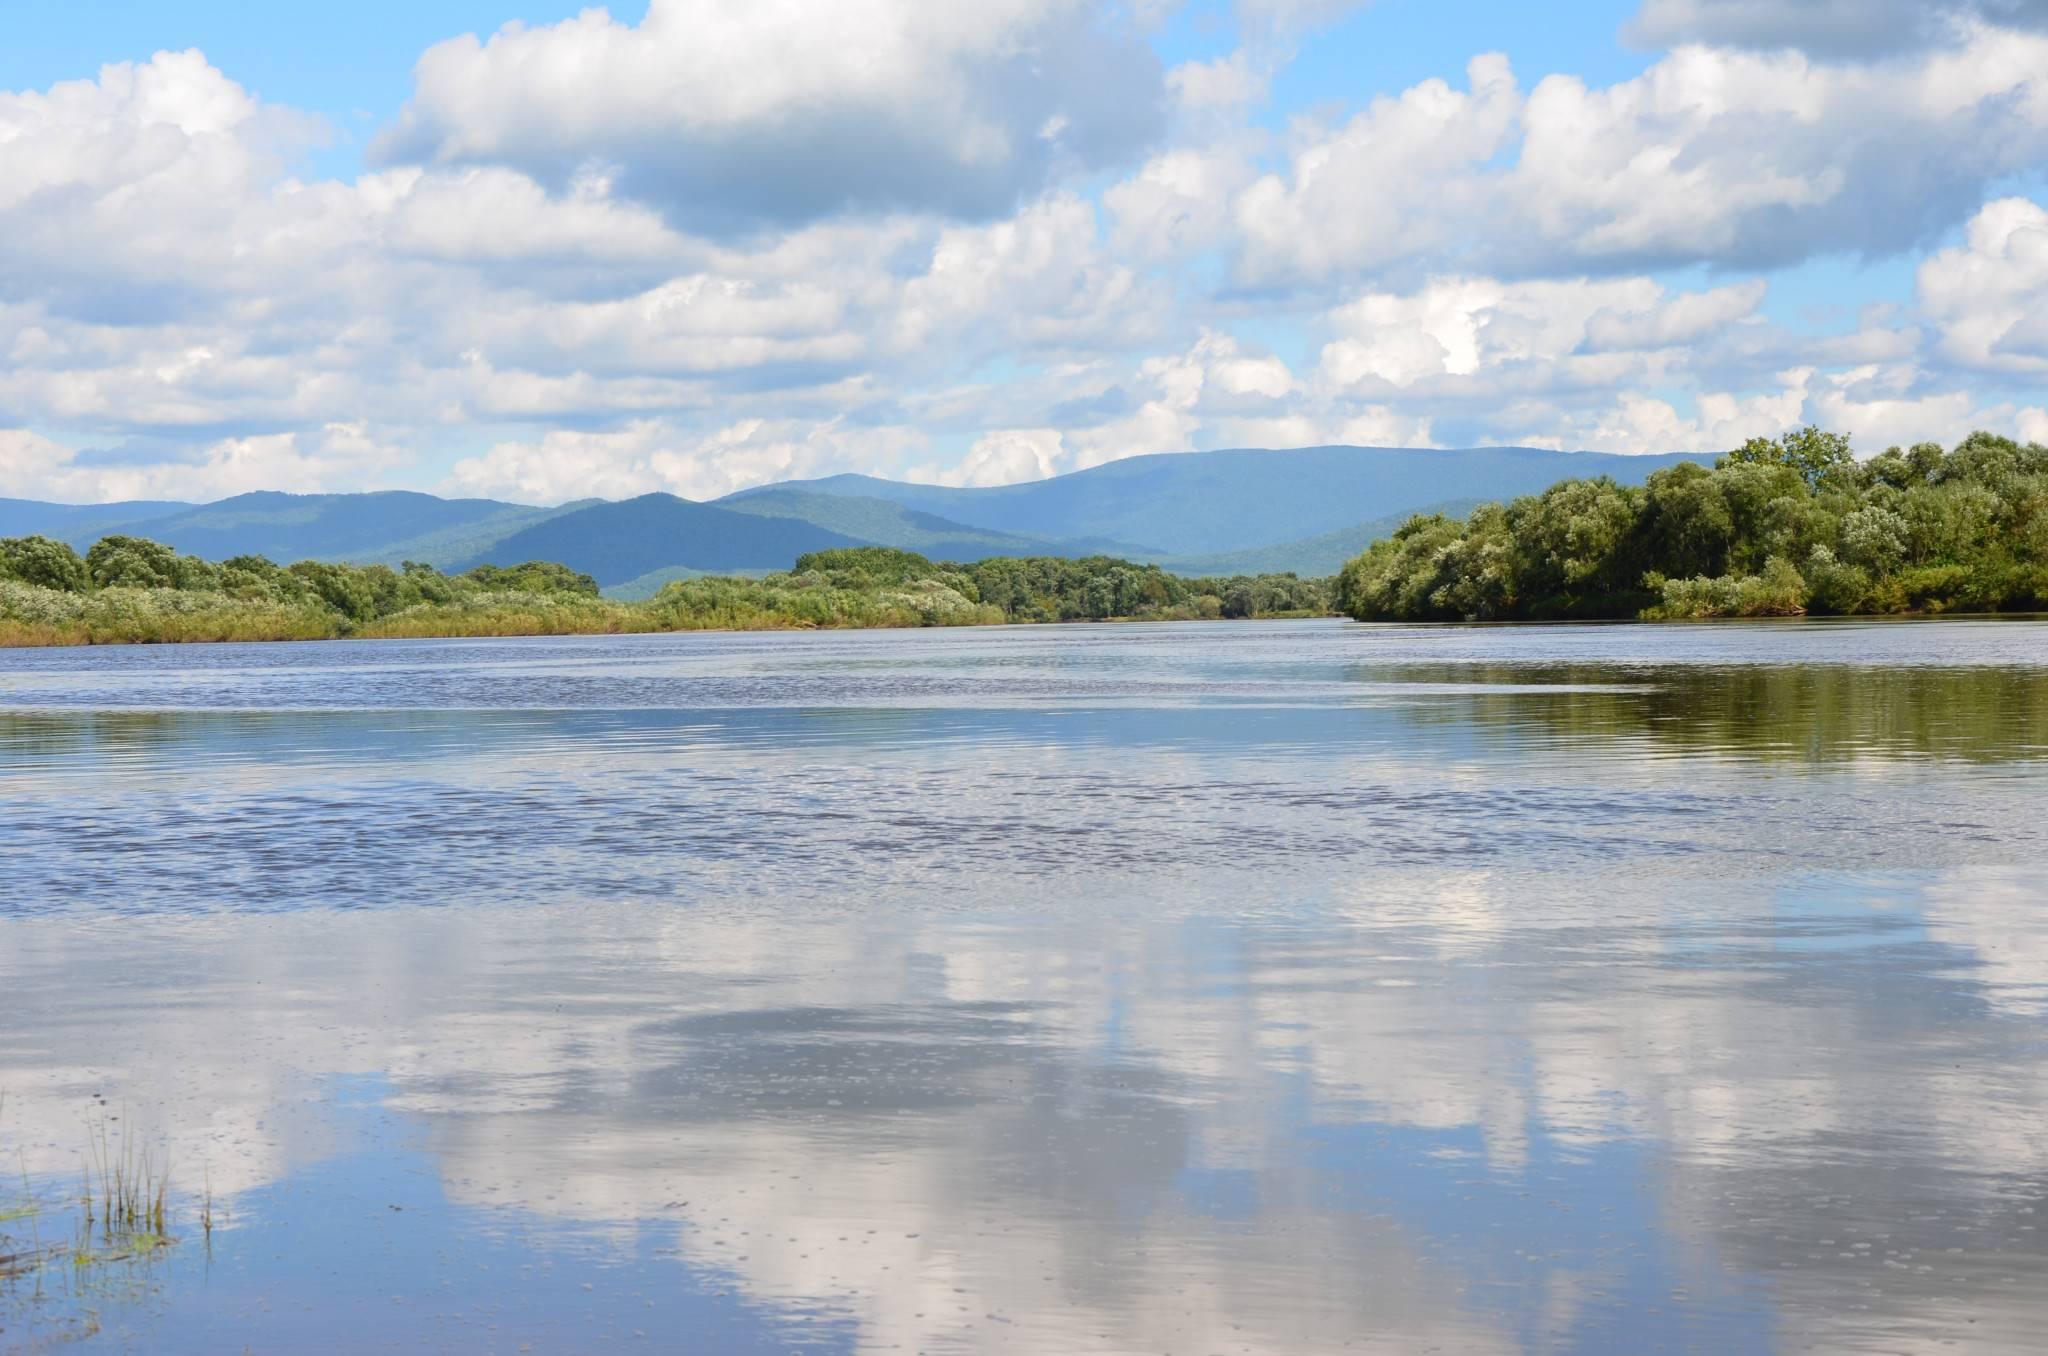 Реки приморского края: фото, описание. рыбалка в реках приморского края